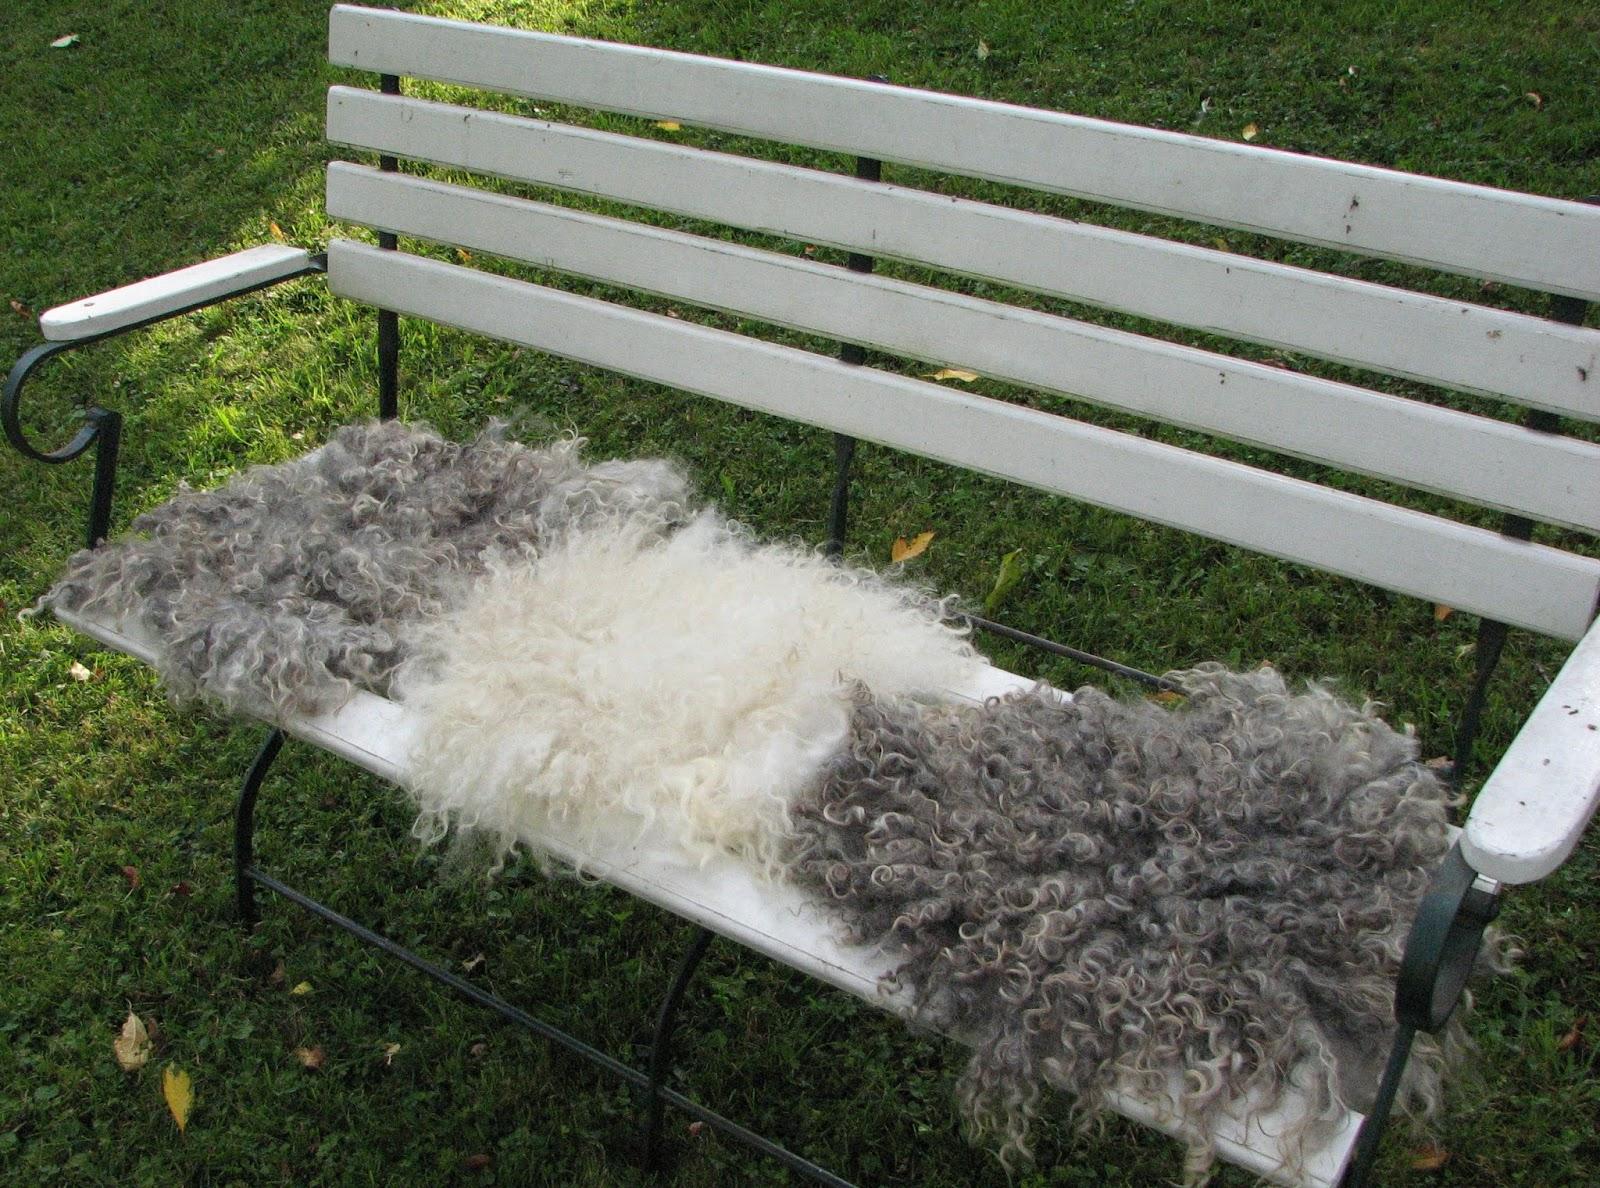 Farbenfaden Sitzfellchen filzen